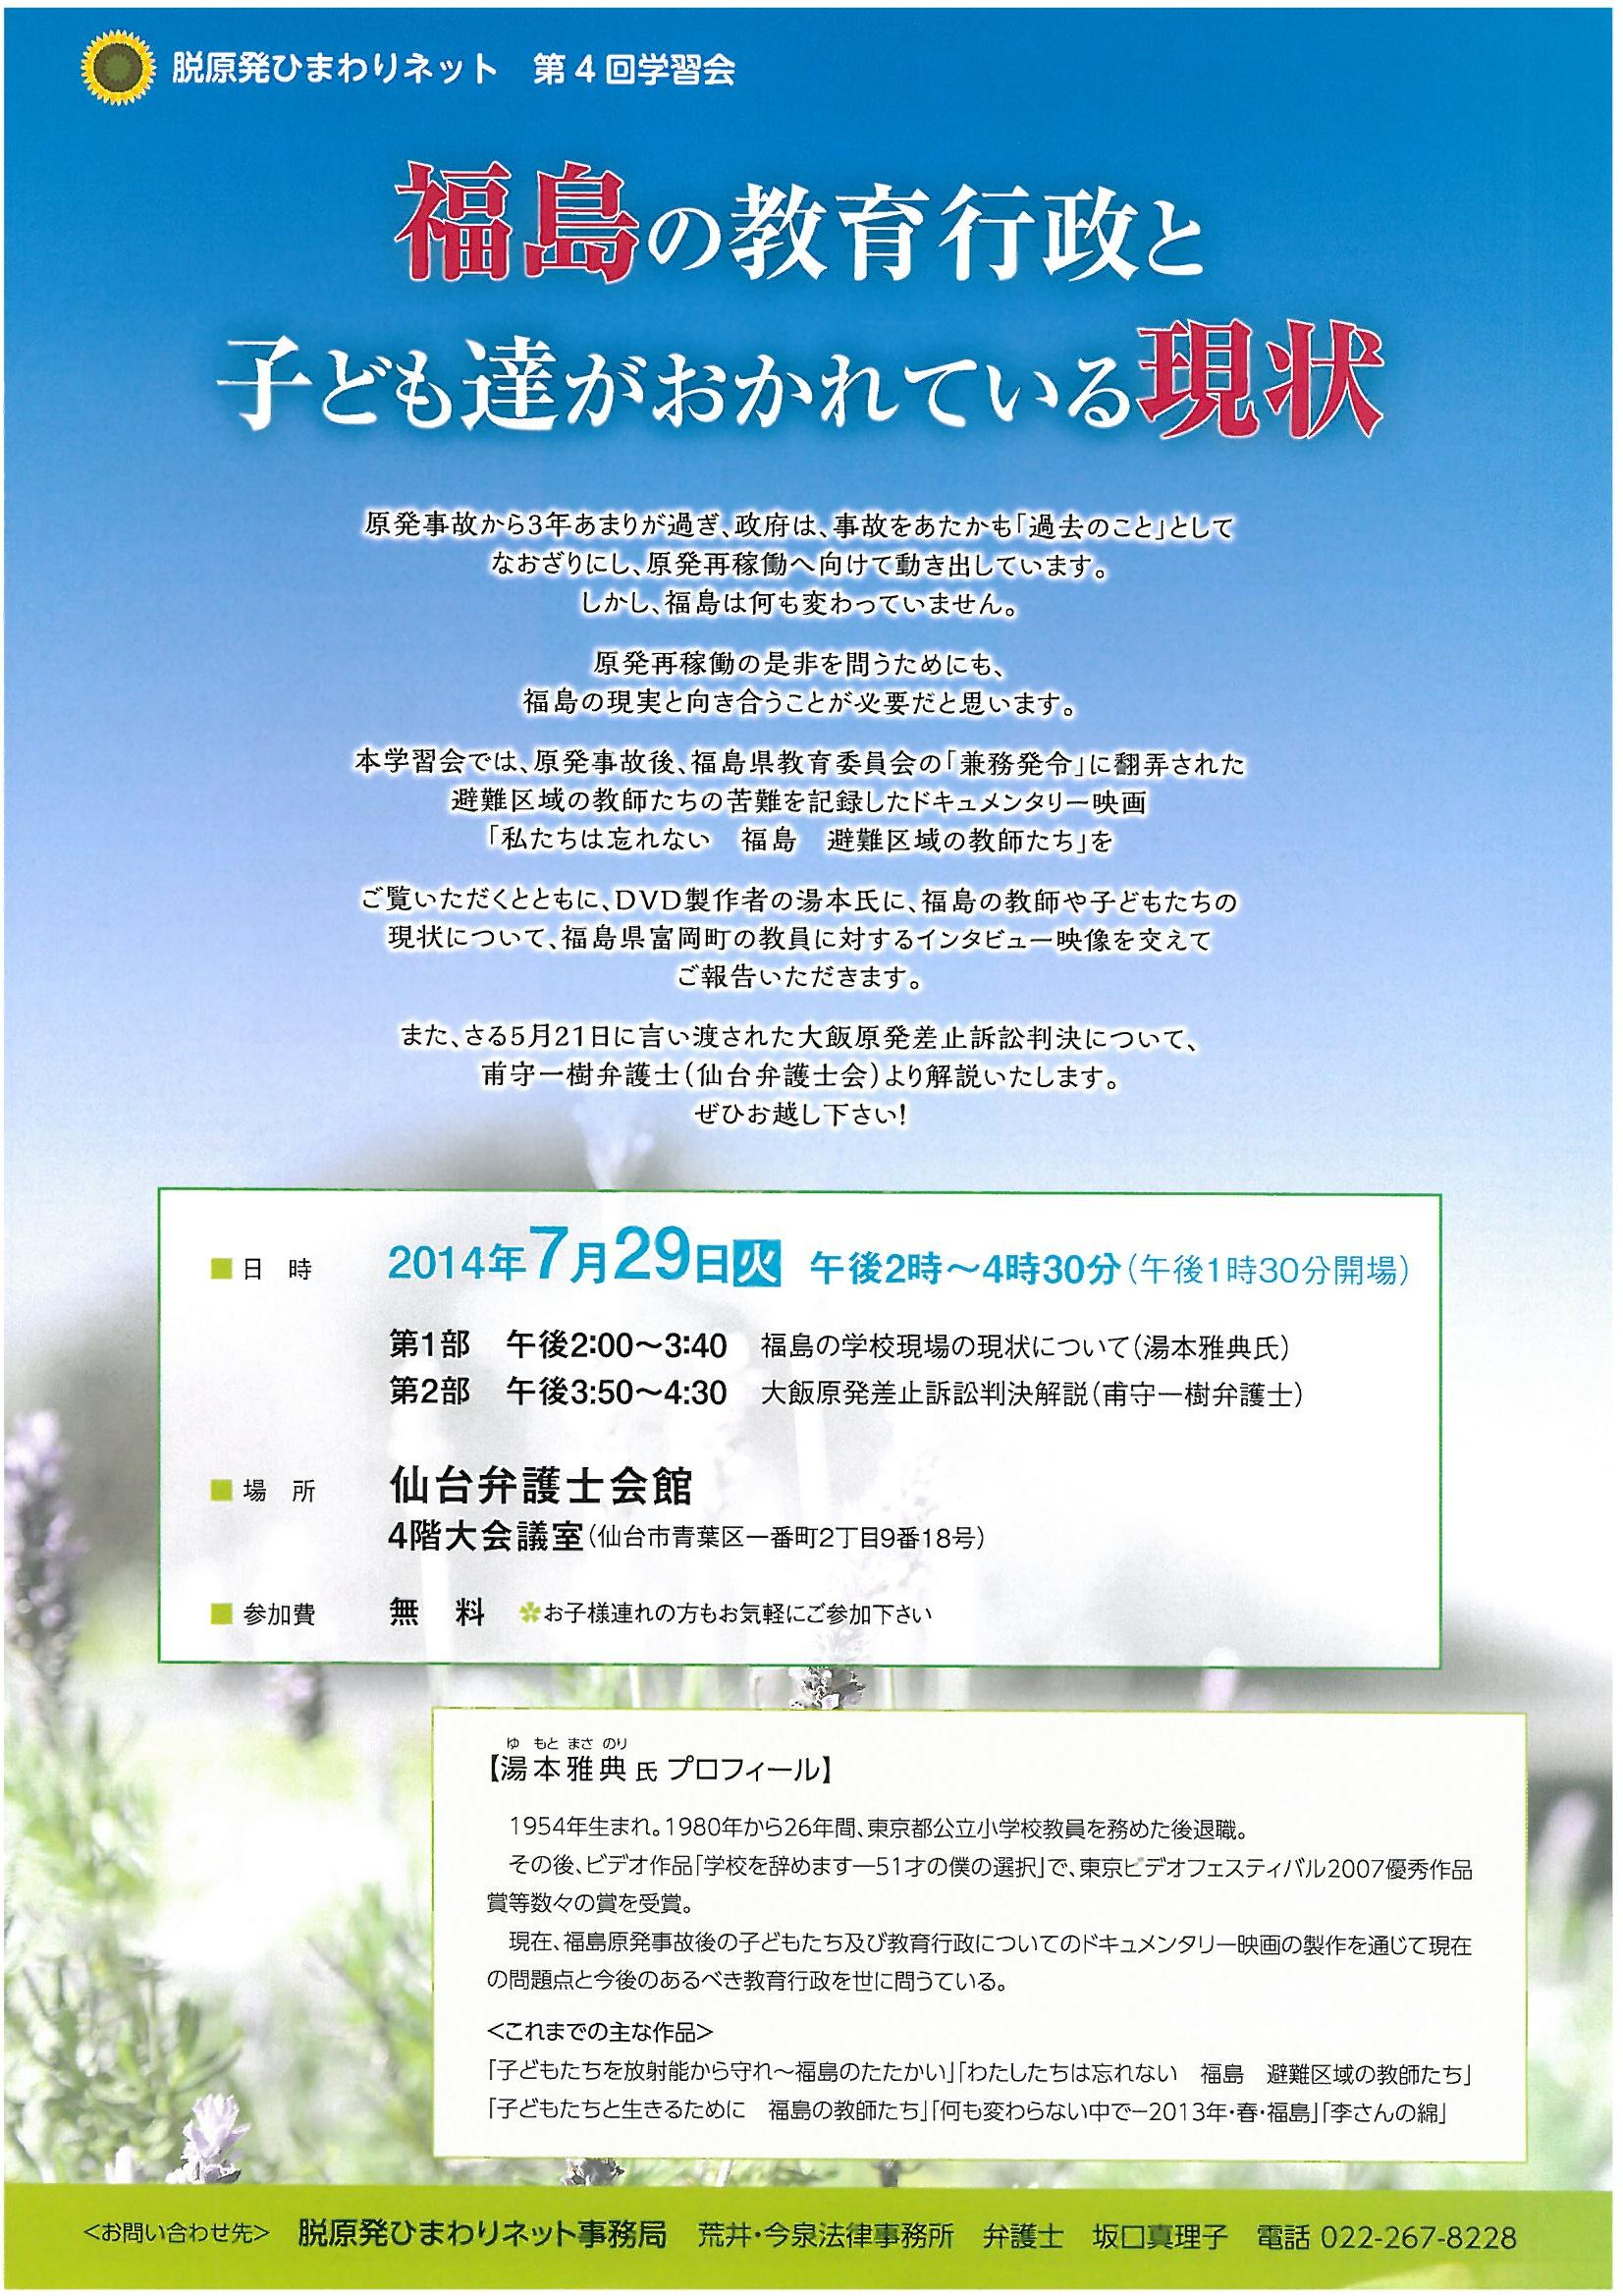 SKMBT_C22014071815550_0002.jpg